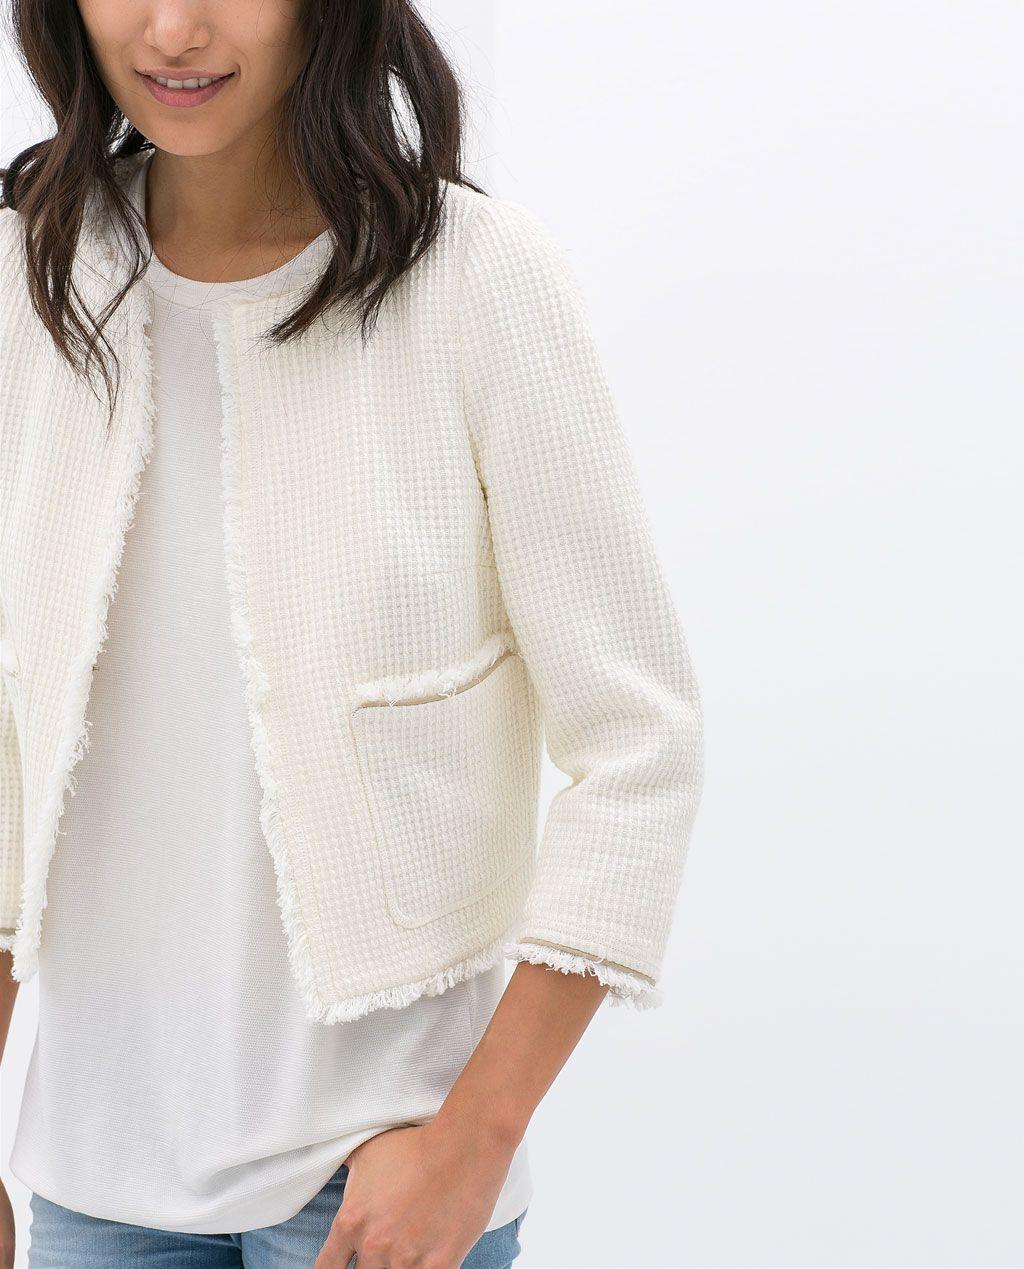 Chanel Tweed Jackets 7 to Wear in Autumn